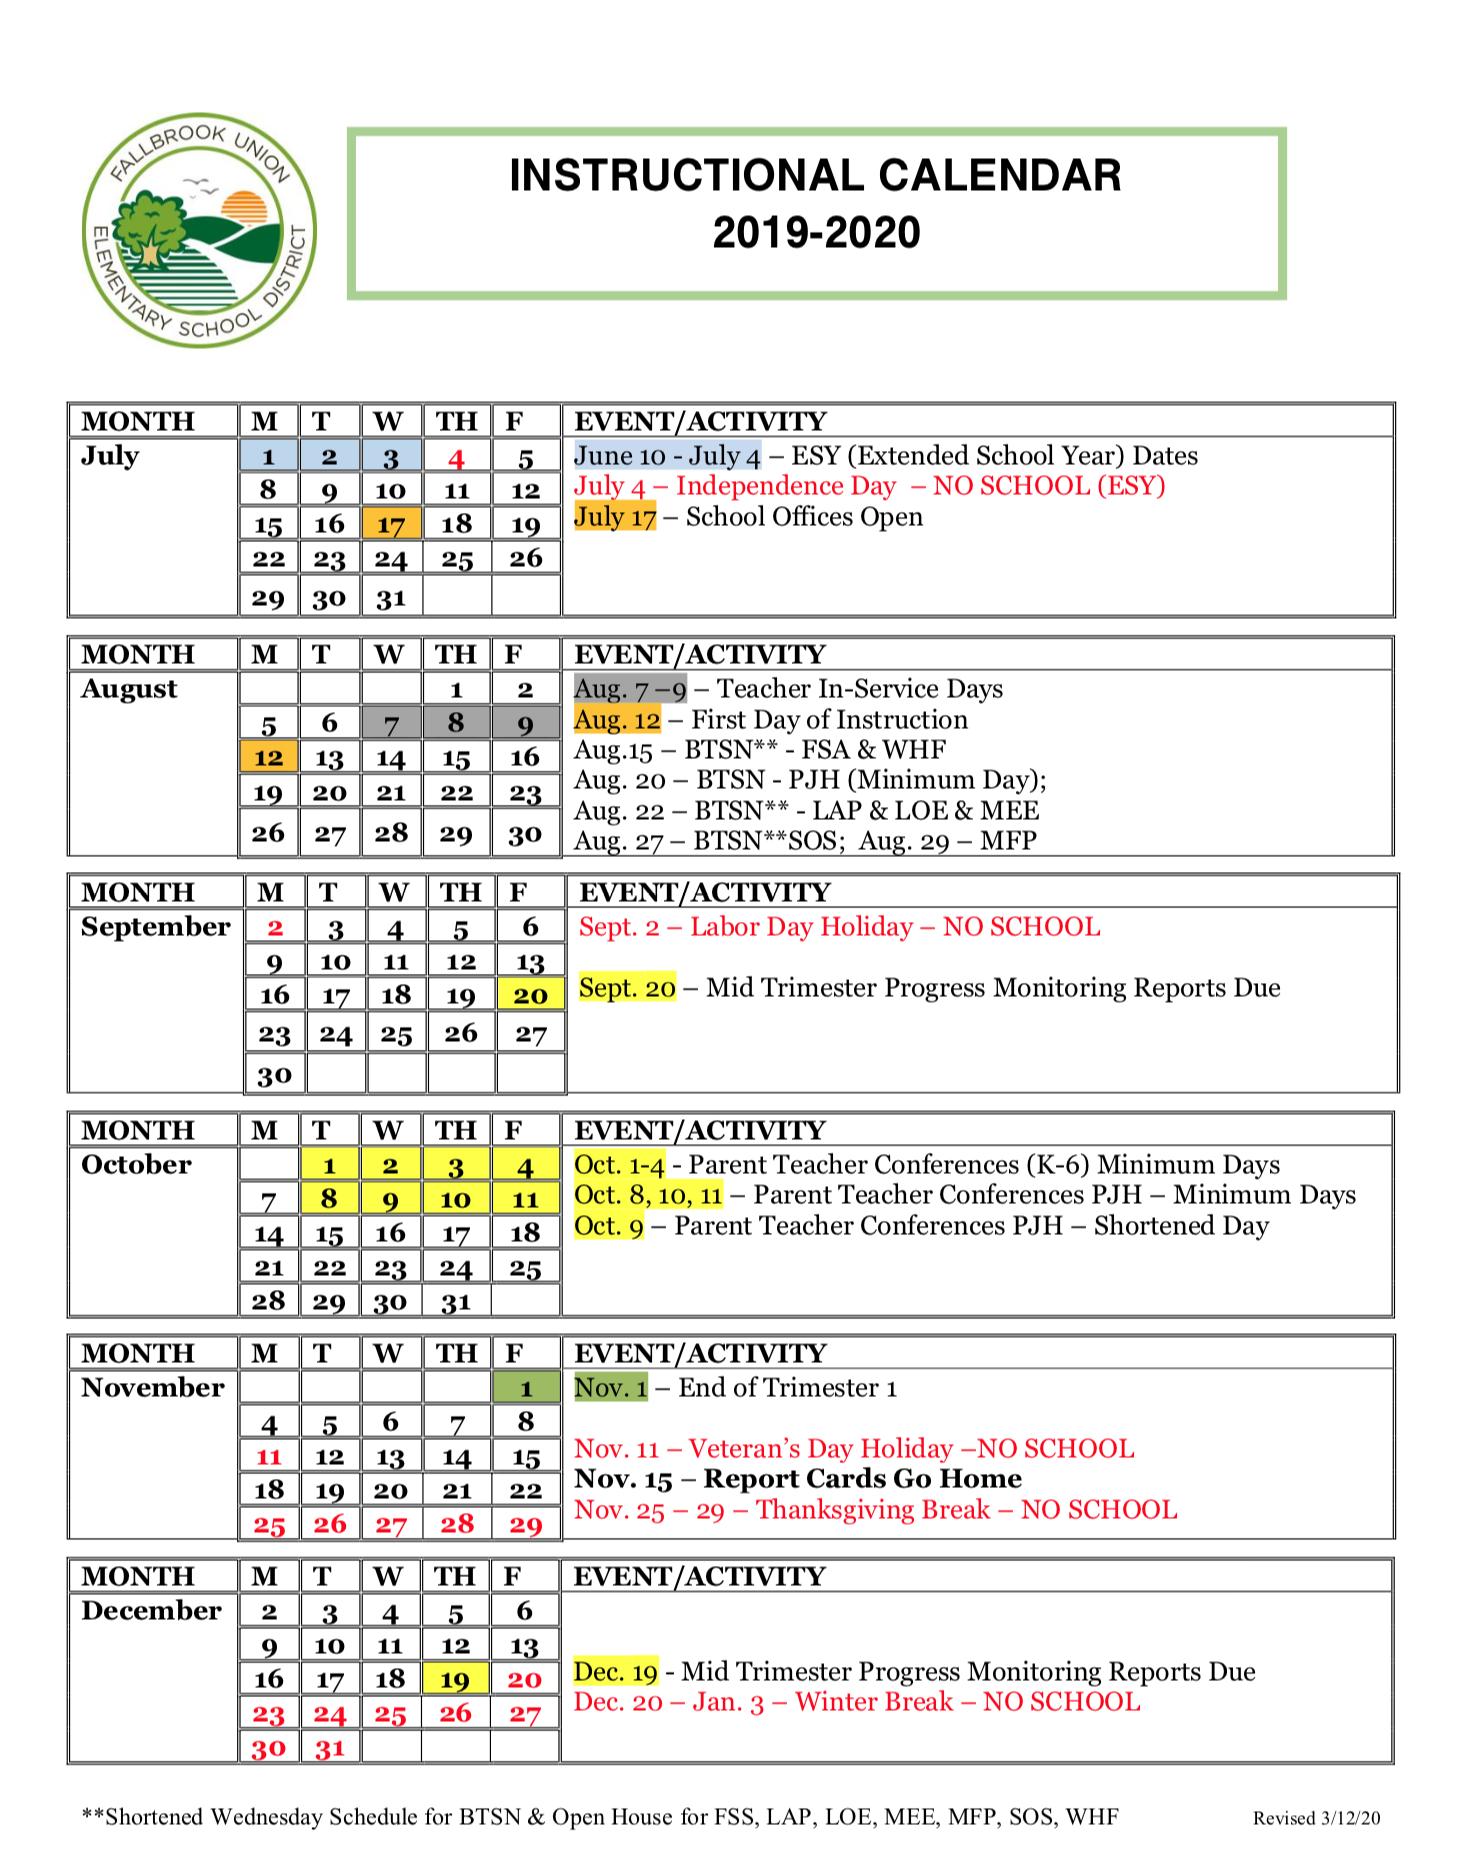 Instructional Calendar   Fallbrook Union Elementary School Inside William And Mary School Calendar 2021 2020